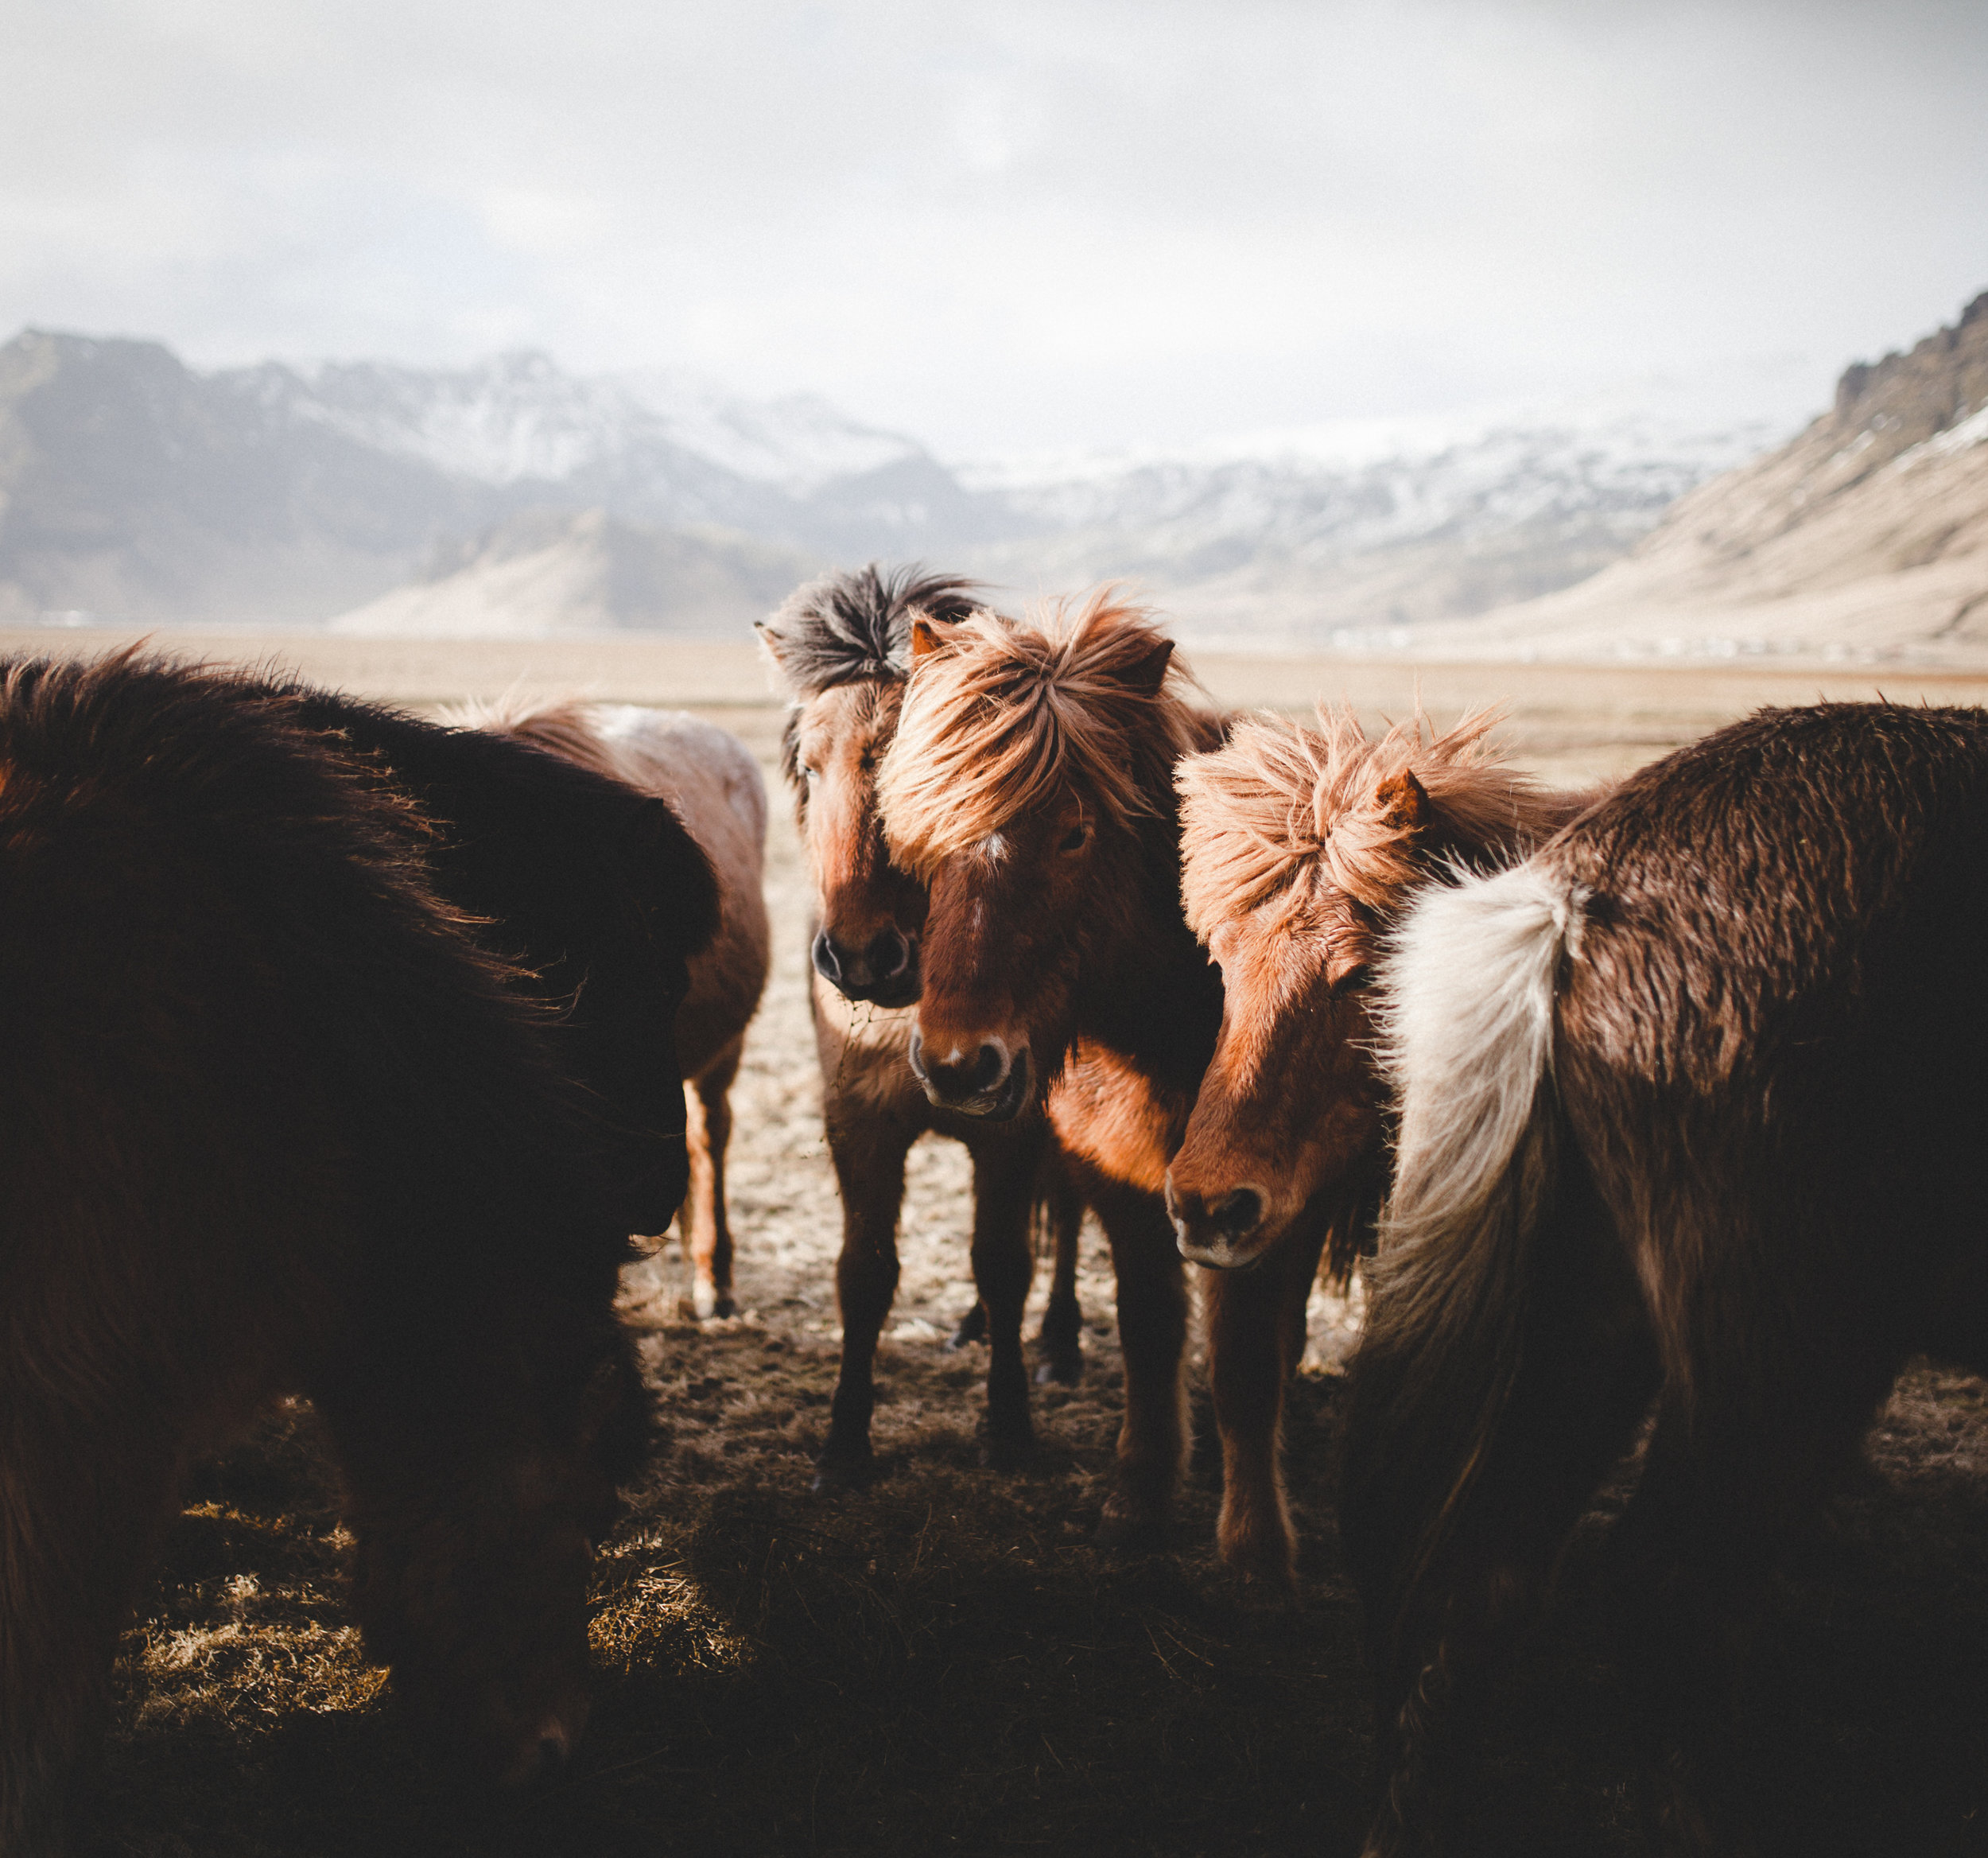 Icelandichorses